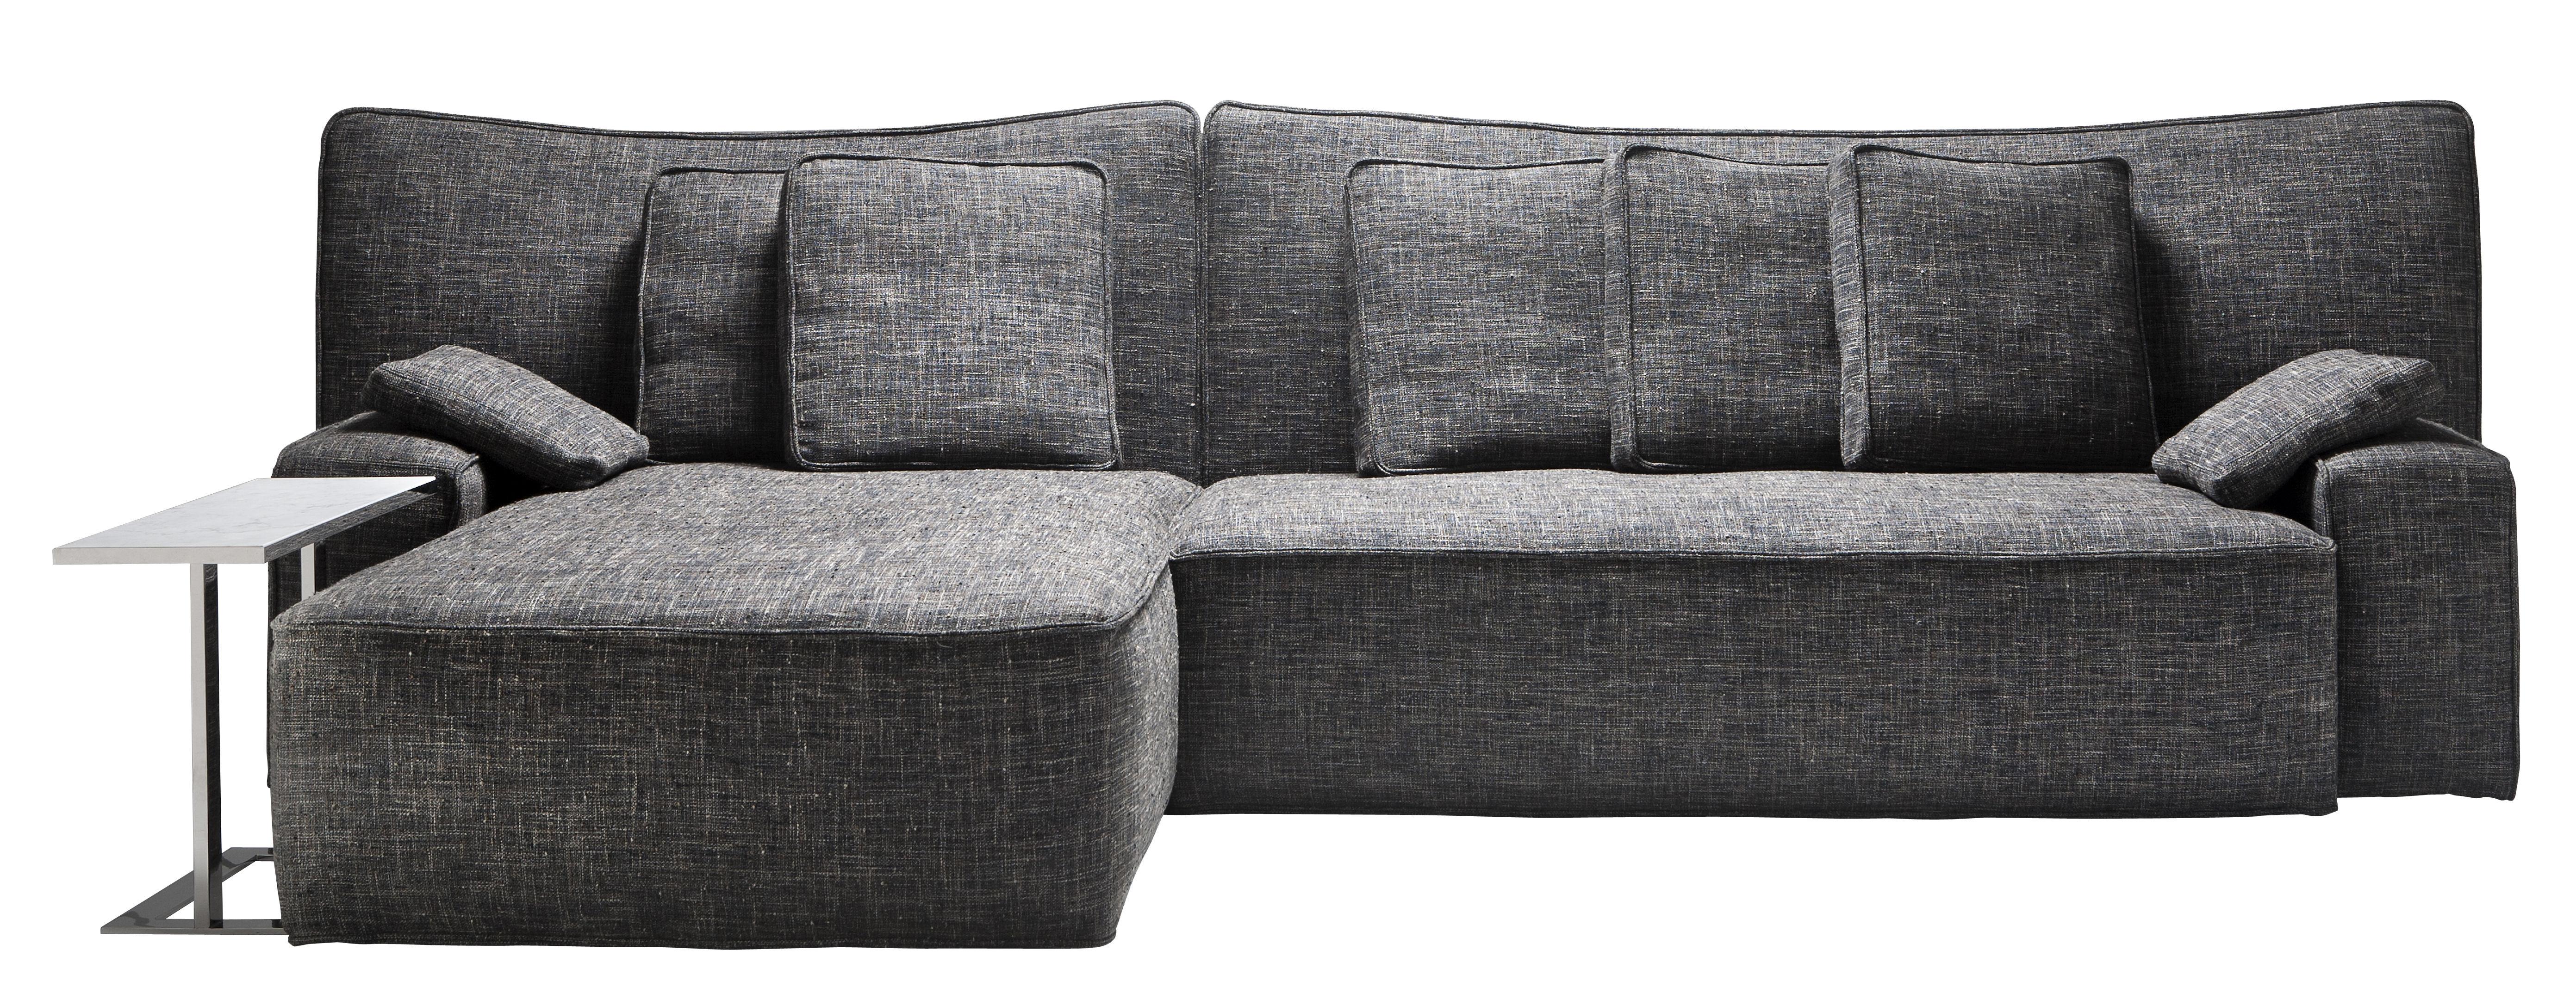 Furniture - Sofas - Wow Sofa Corner sofa - L 339 x P 190 cm by Driade - Blue - Fabric, Polyurethane foam, Wood